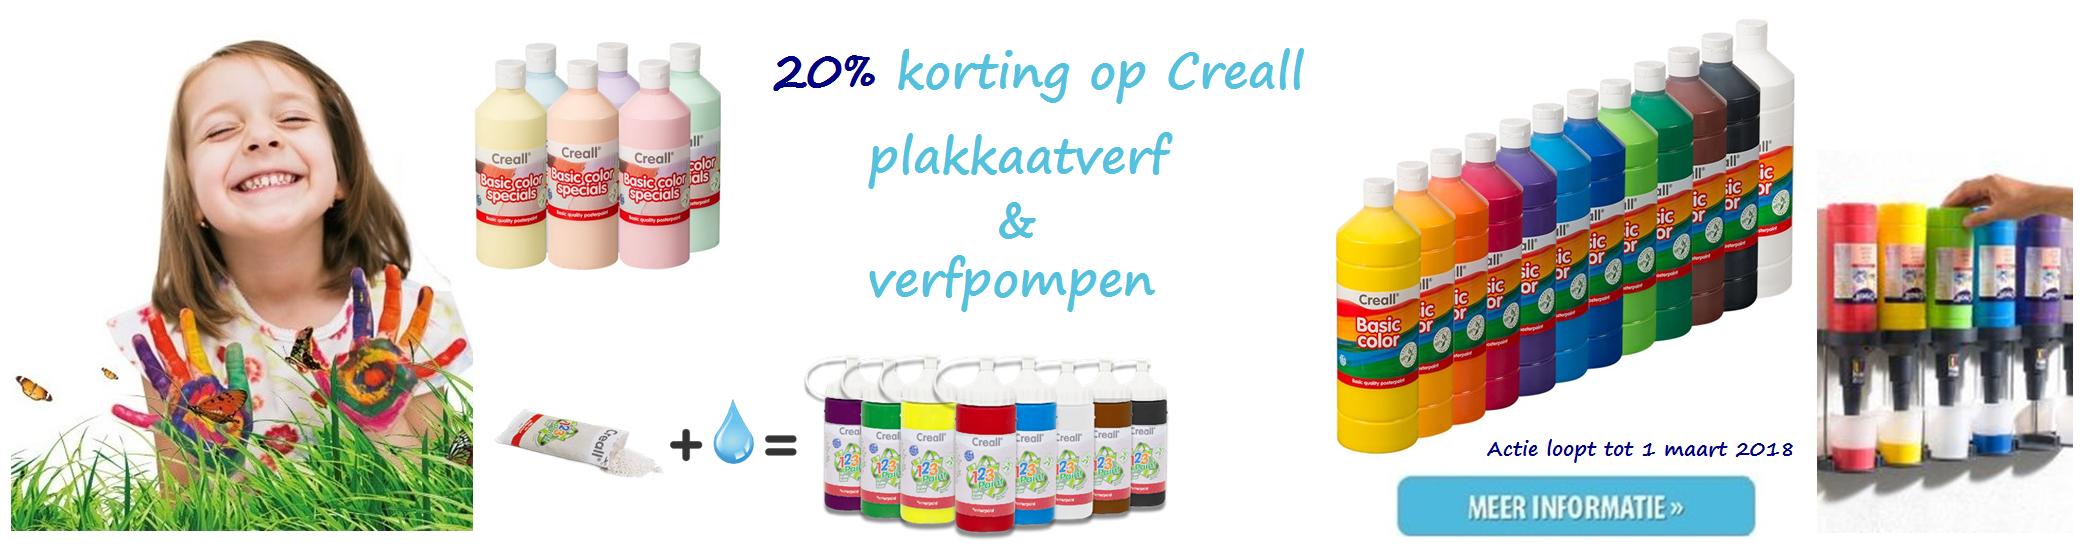 20% korting Creall plakkaatverf en verfpompen tot 01 mrt 2018